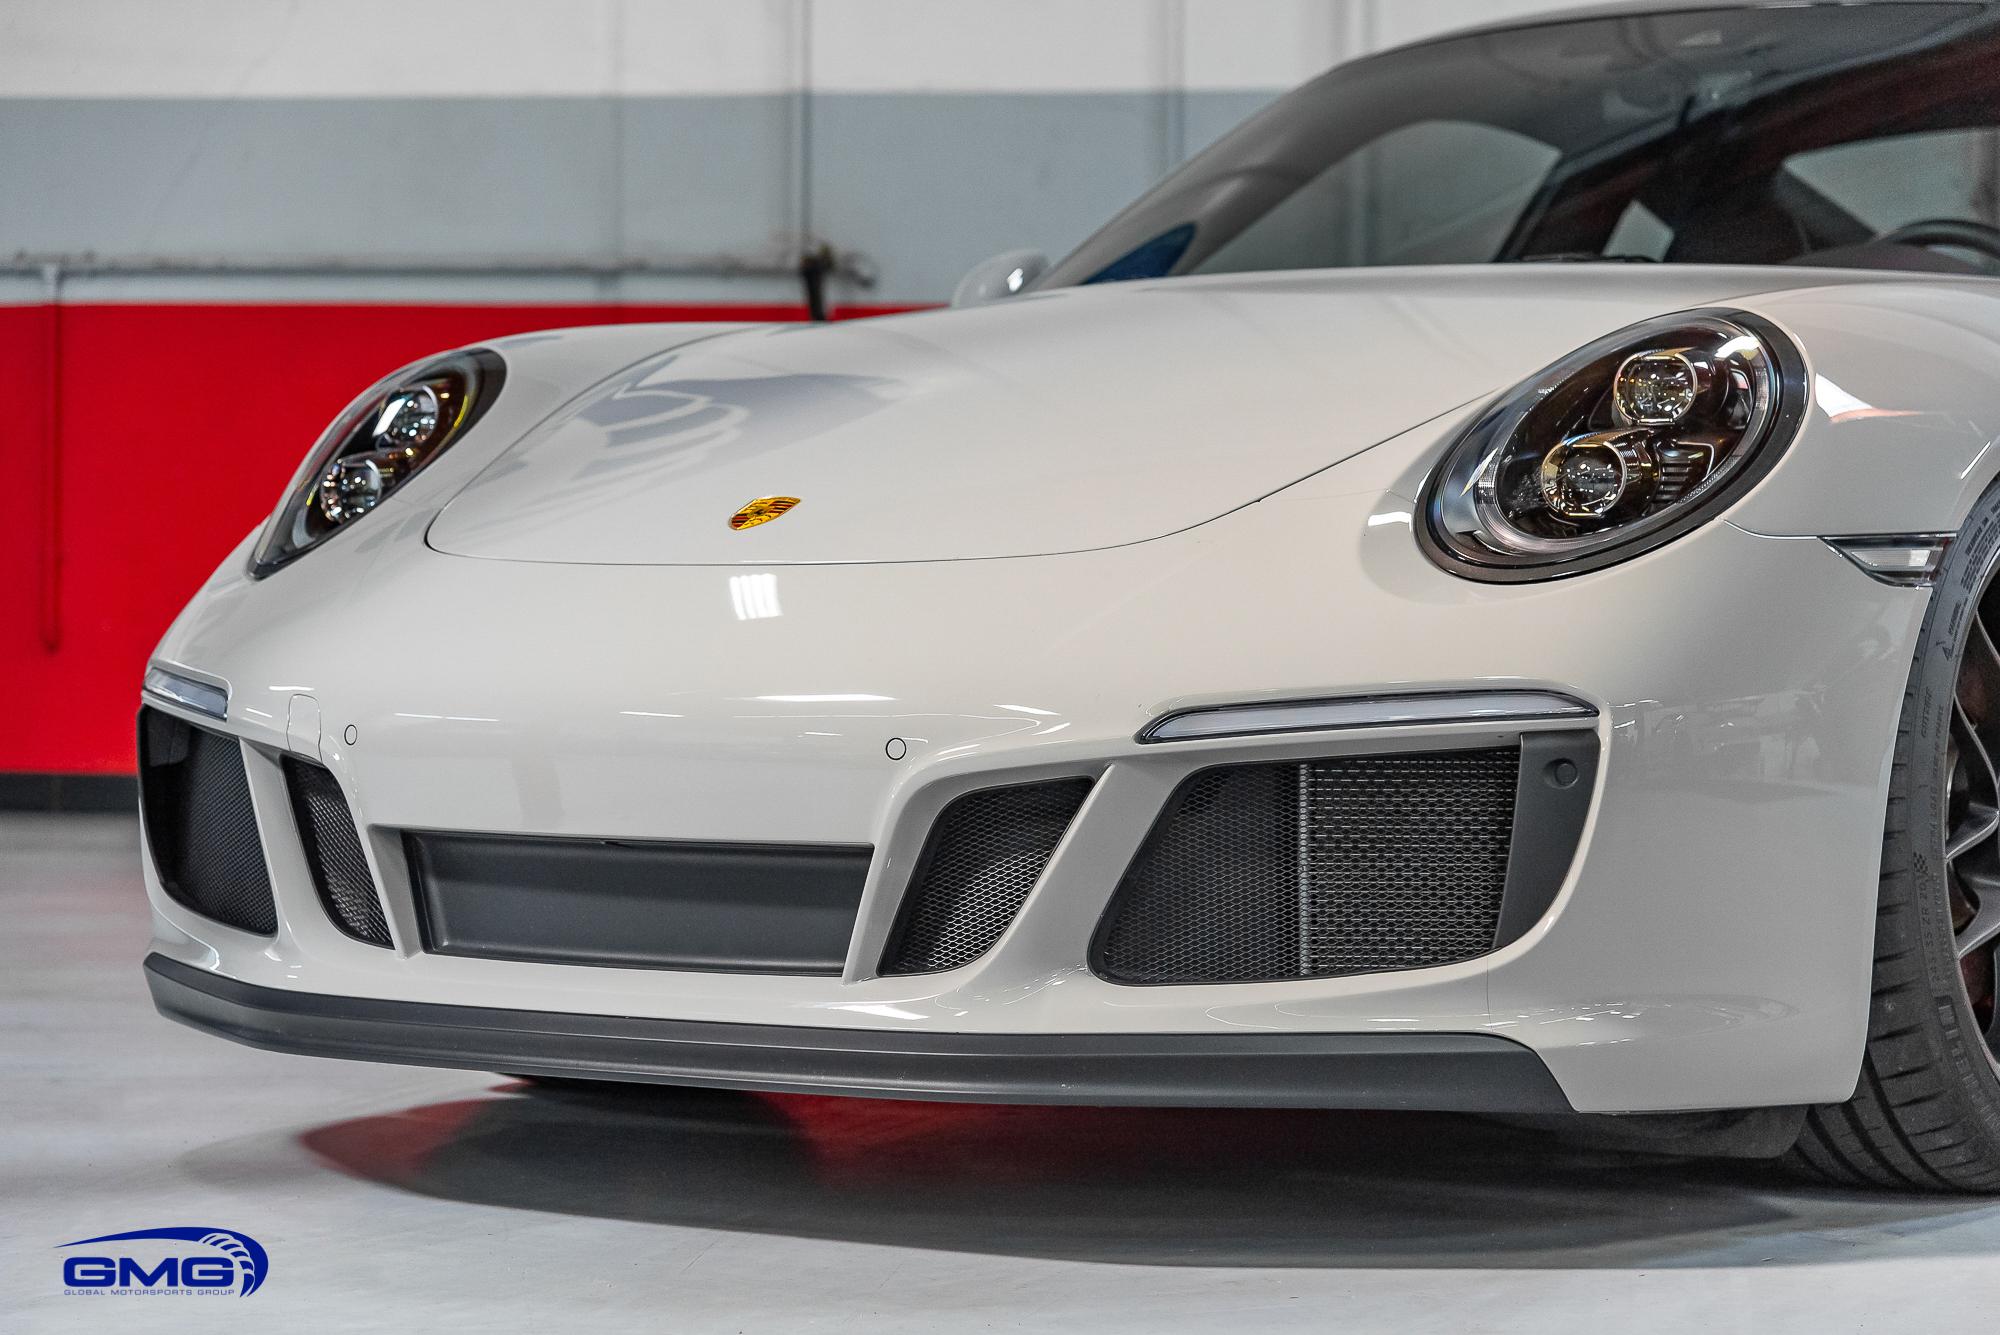 Chalk Porsche 991.2 Carrera GTS